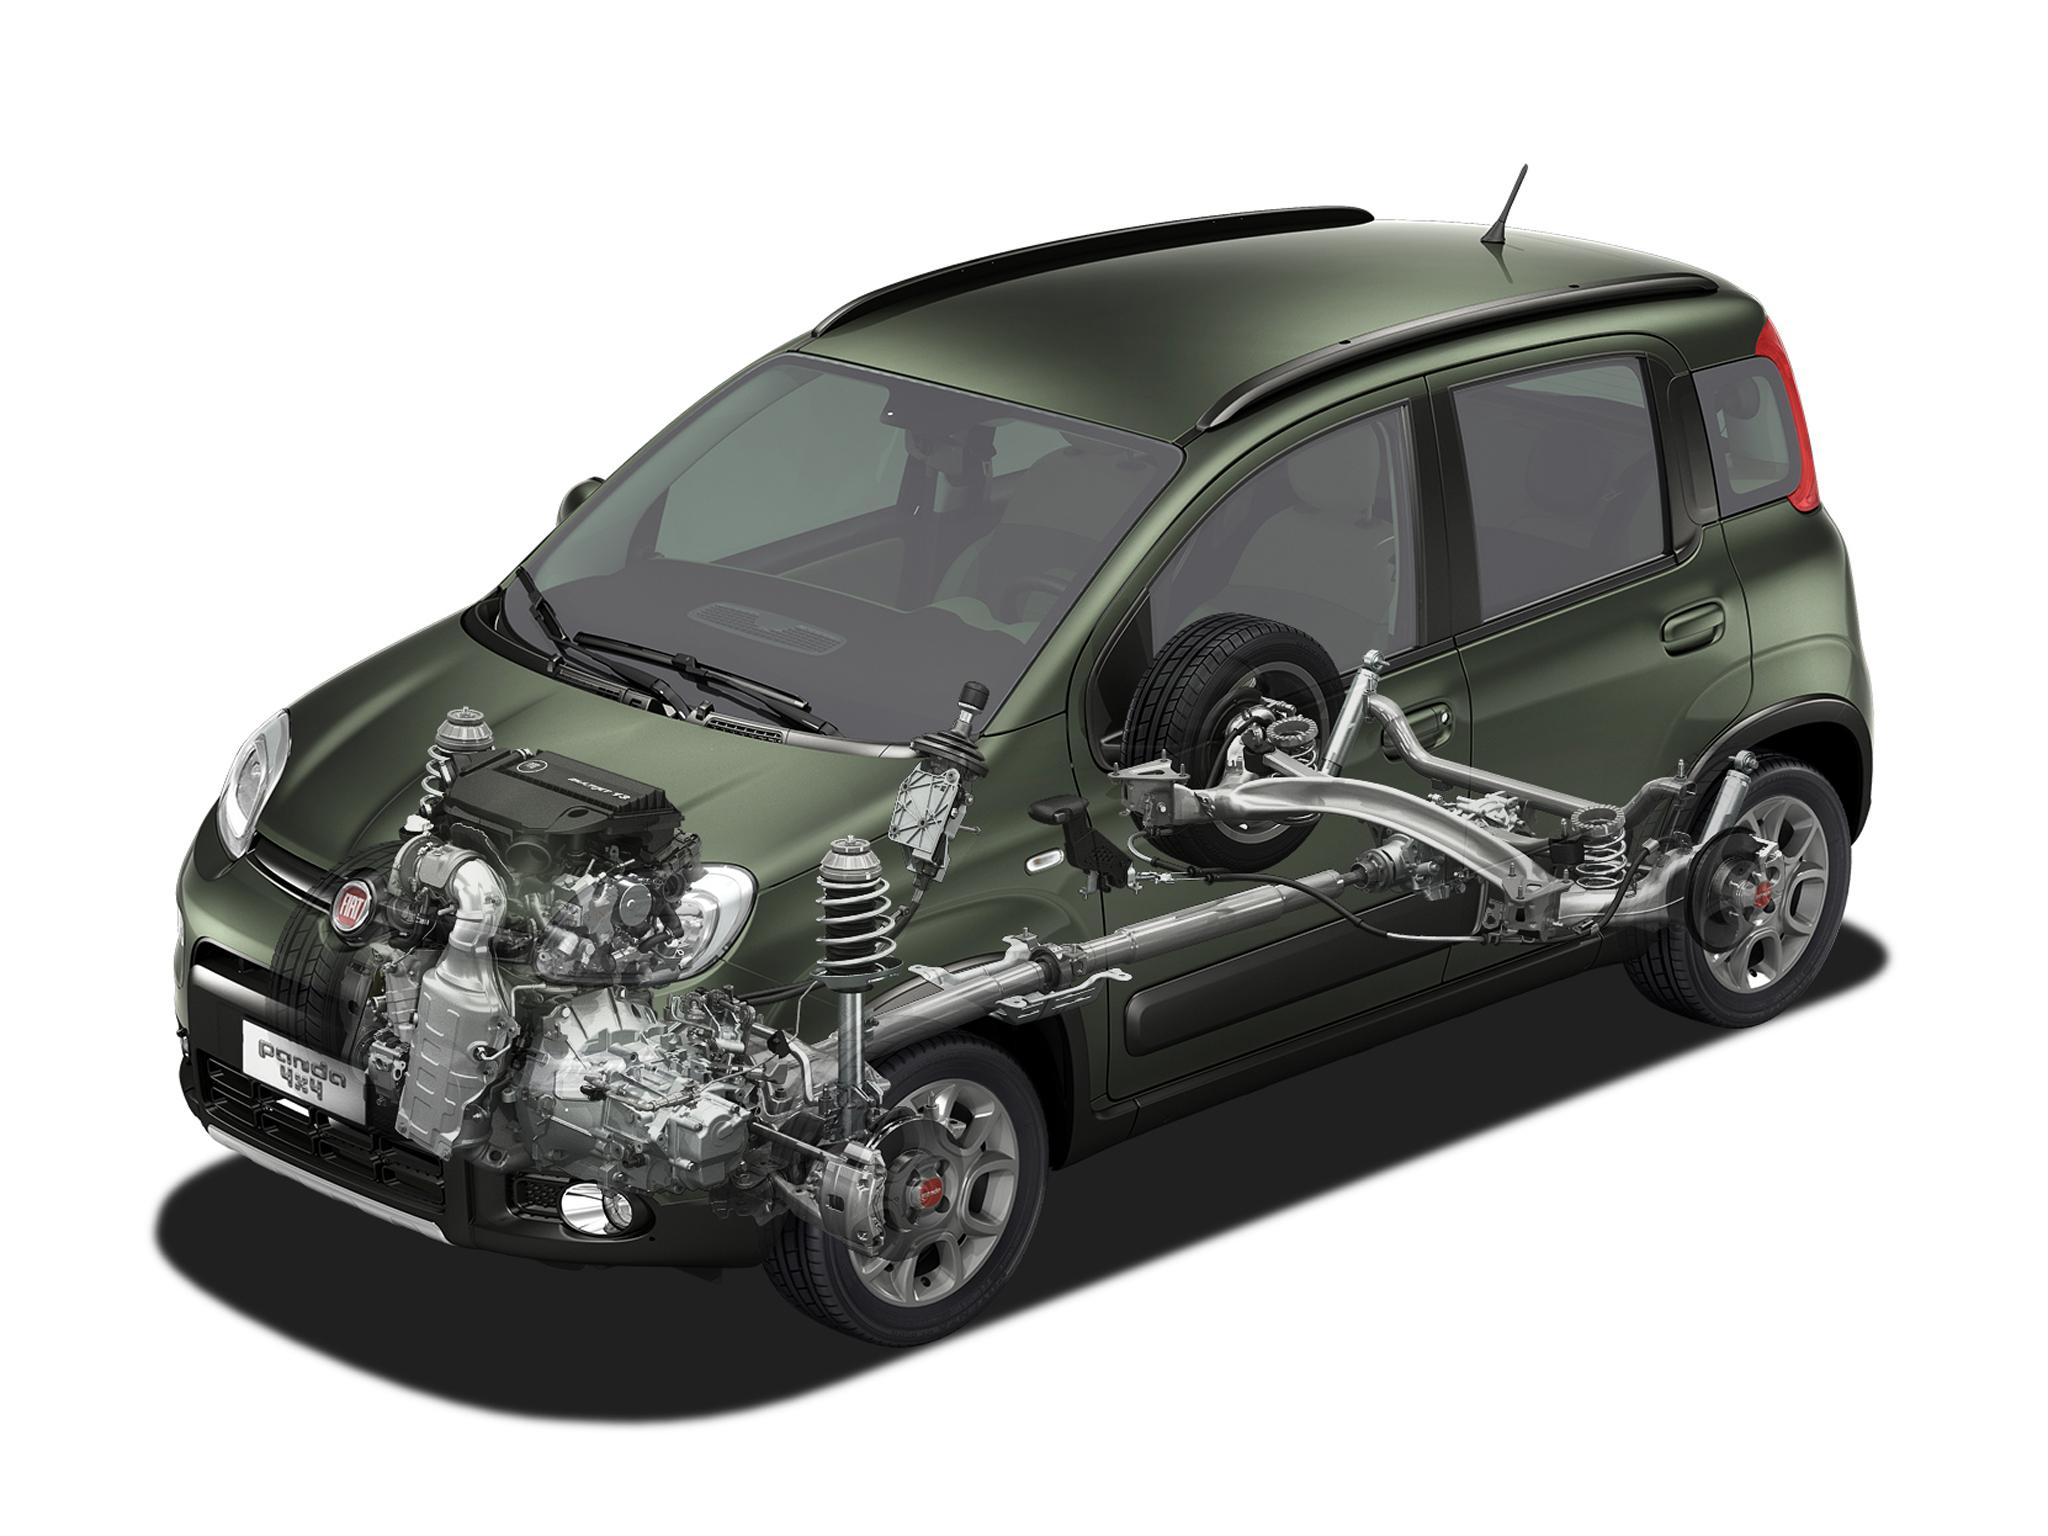 Report: Small Jeep Model (A-Segment) Reportedly In The